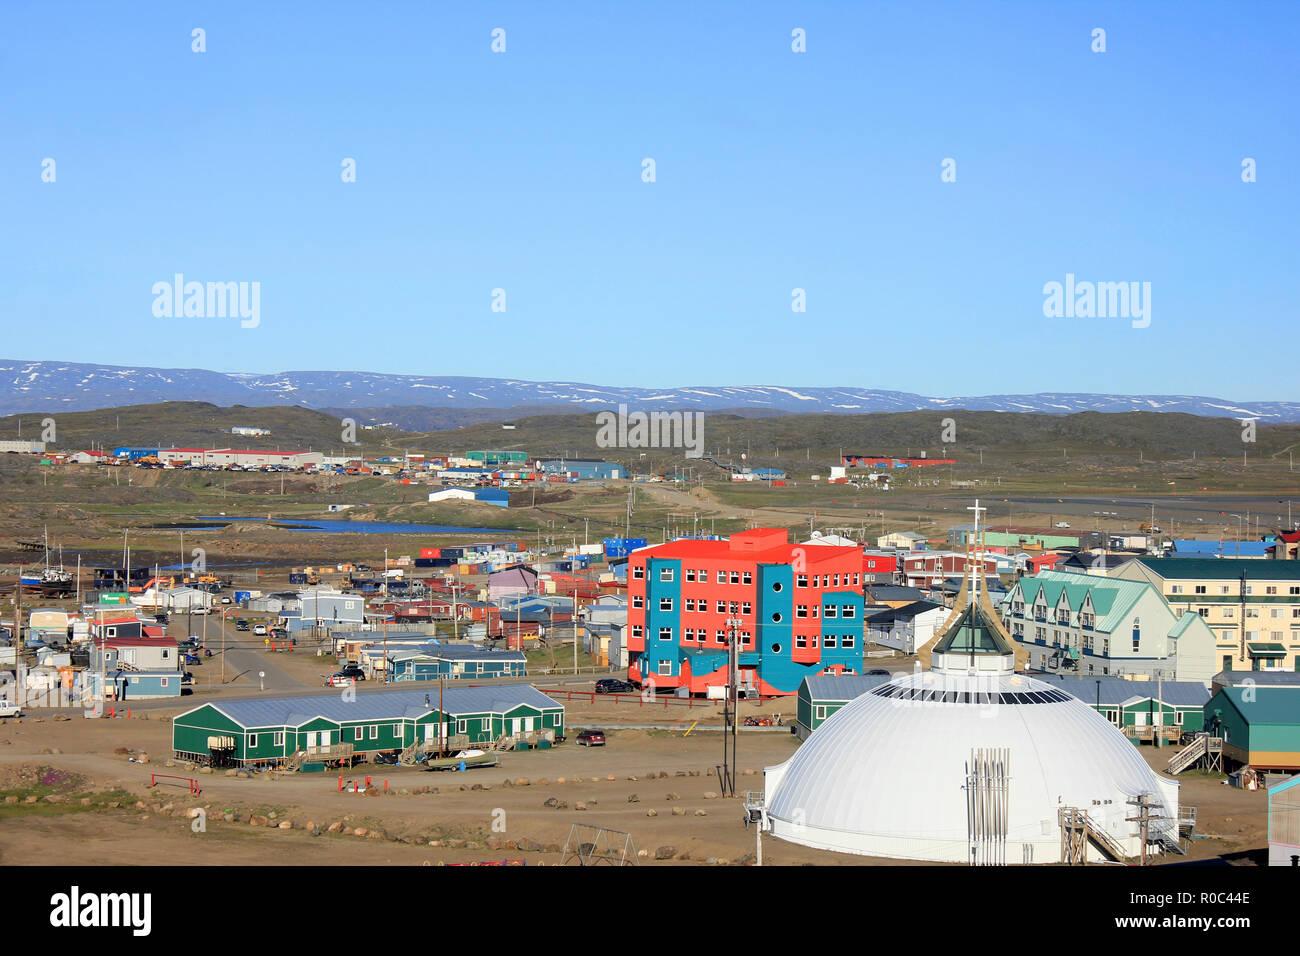 Iqaluit, Baffin Island, Nunavut, Canada - Stock Image